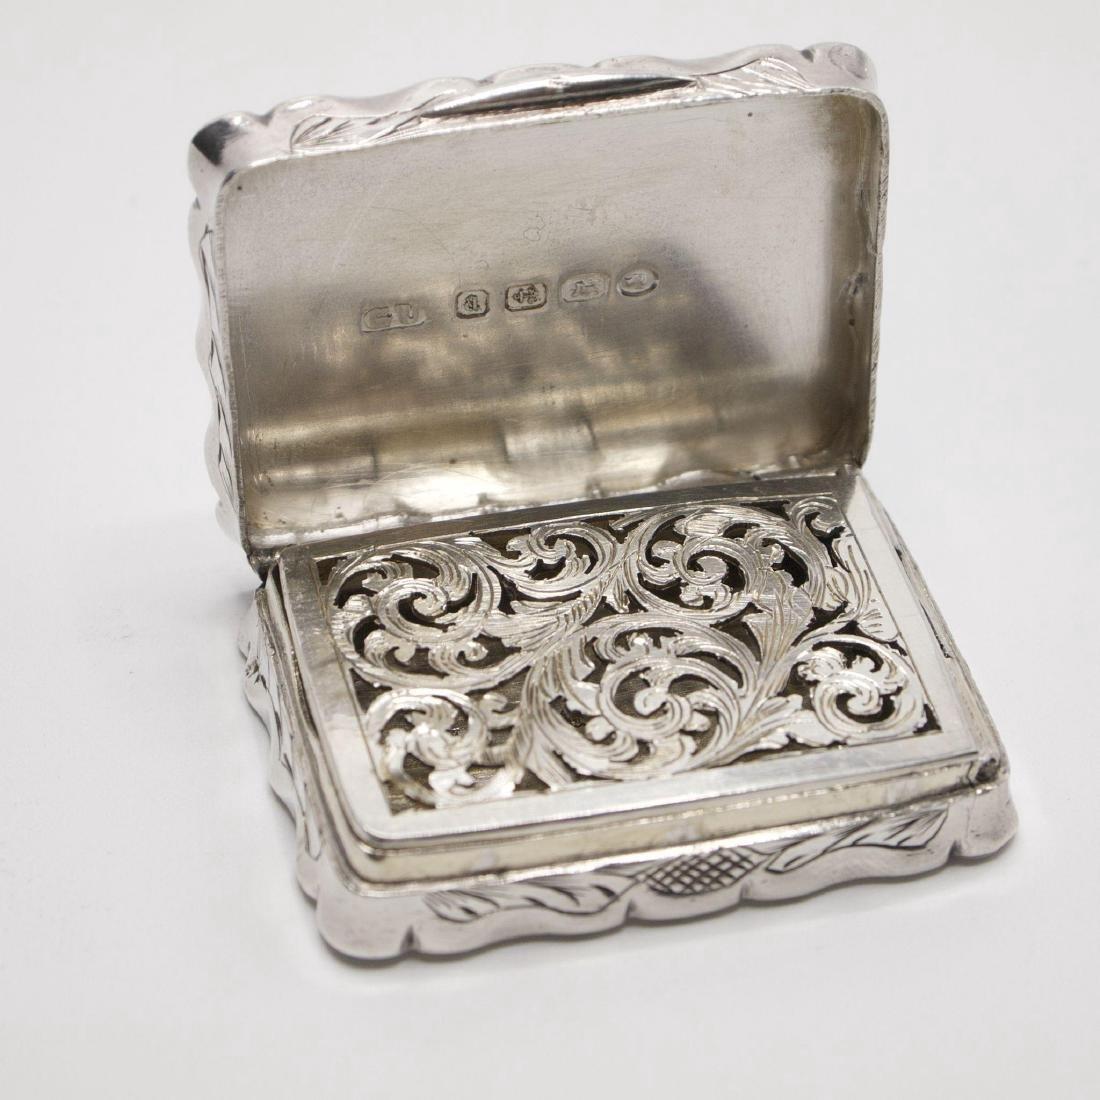 Antique Victorian Sterling Silver Vinaigrette, 1875 - 2